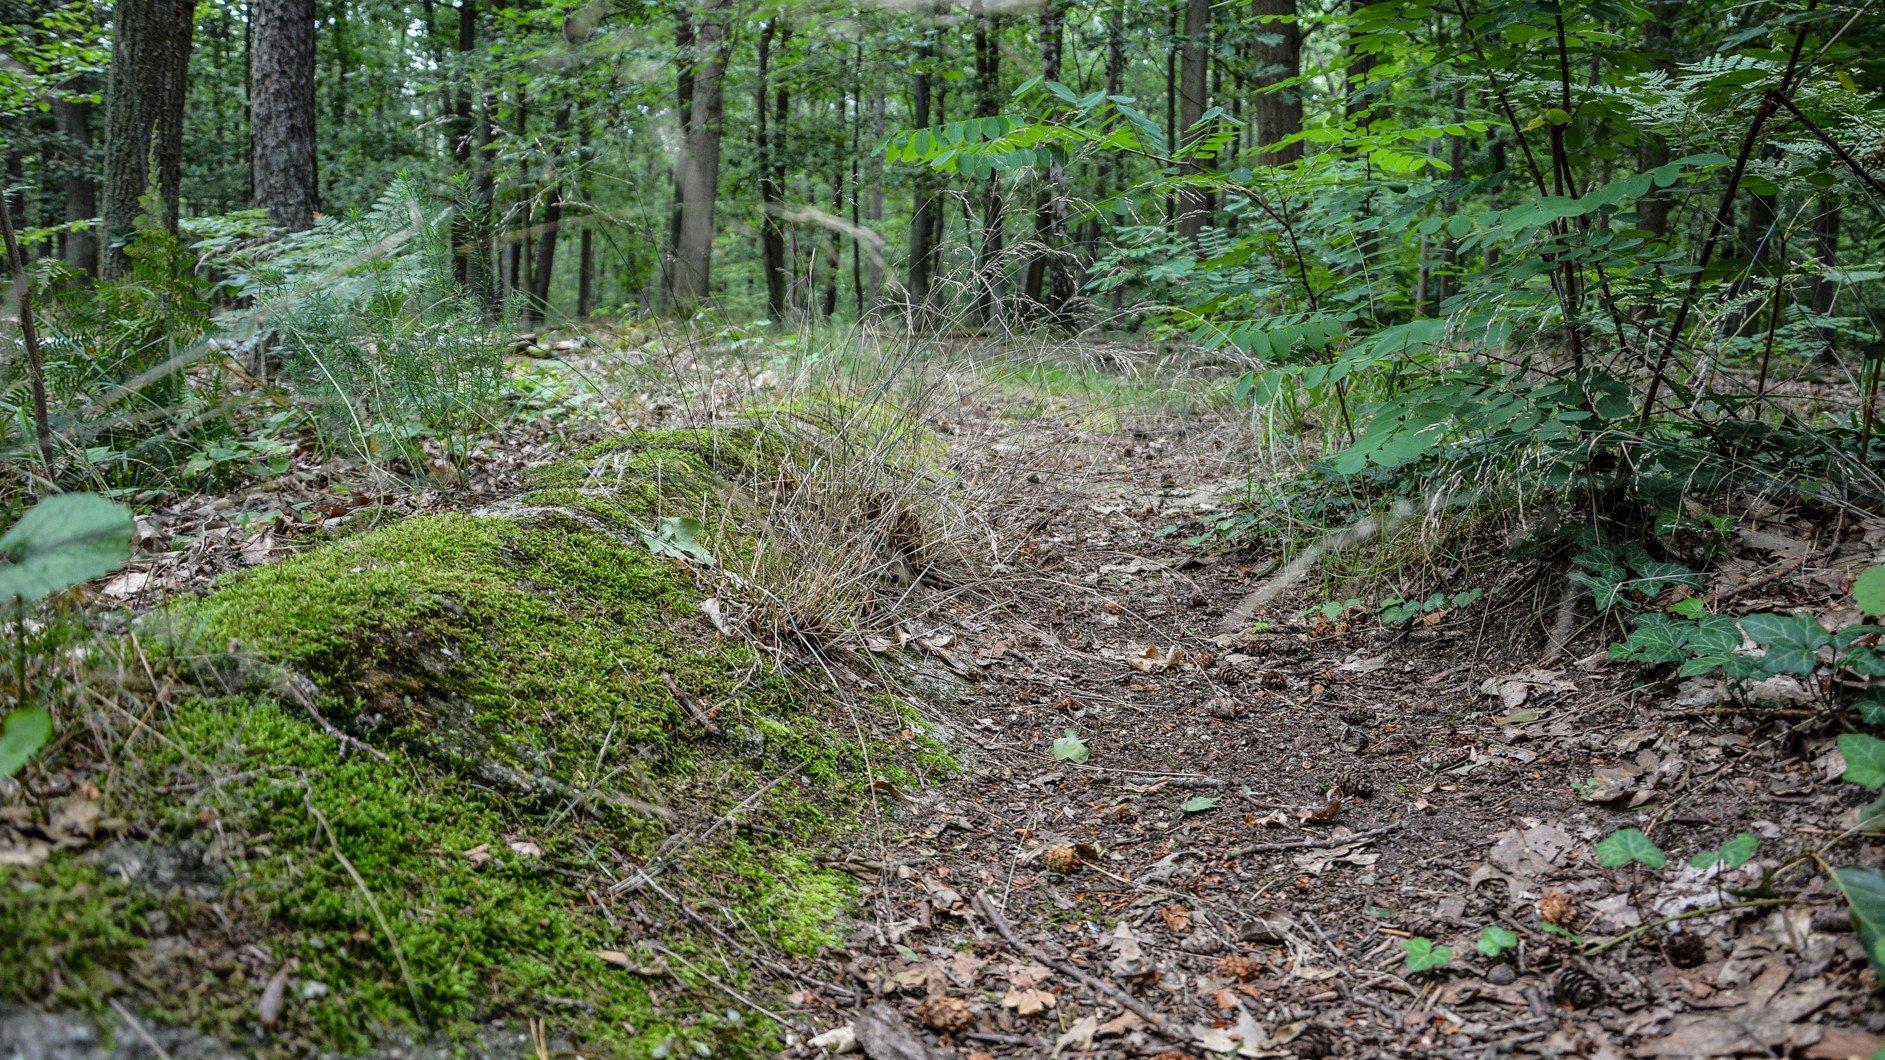 moss avus südkurve modell berlin charlottenburg lost places urbex abandoned berlin